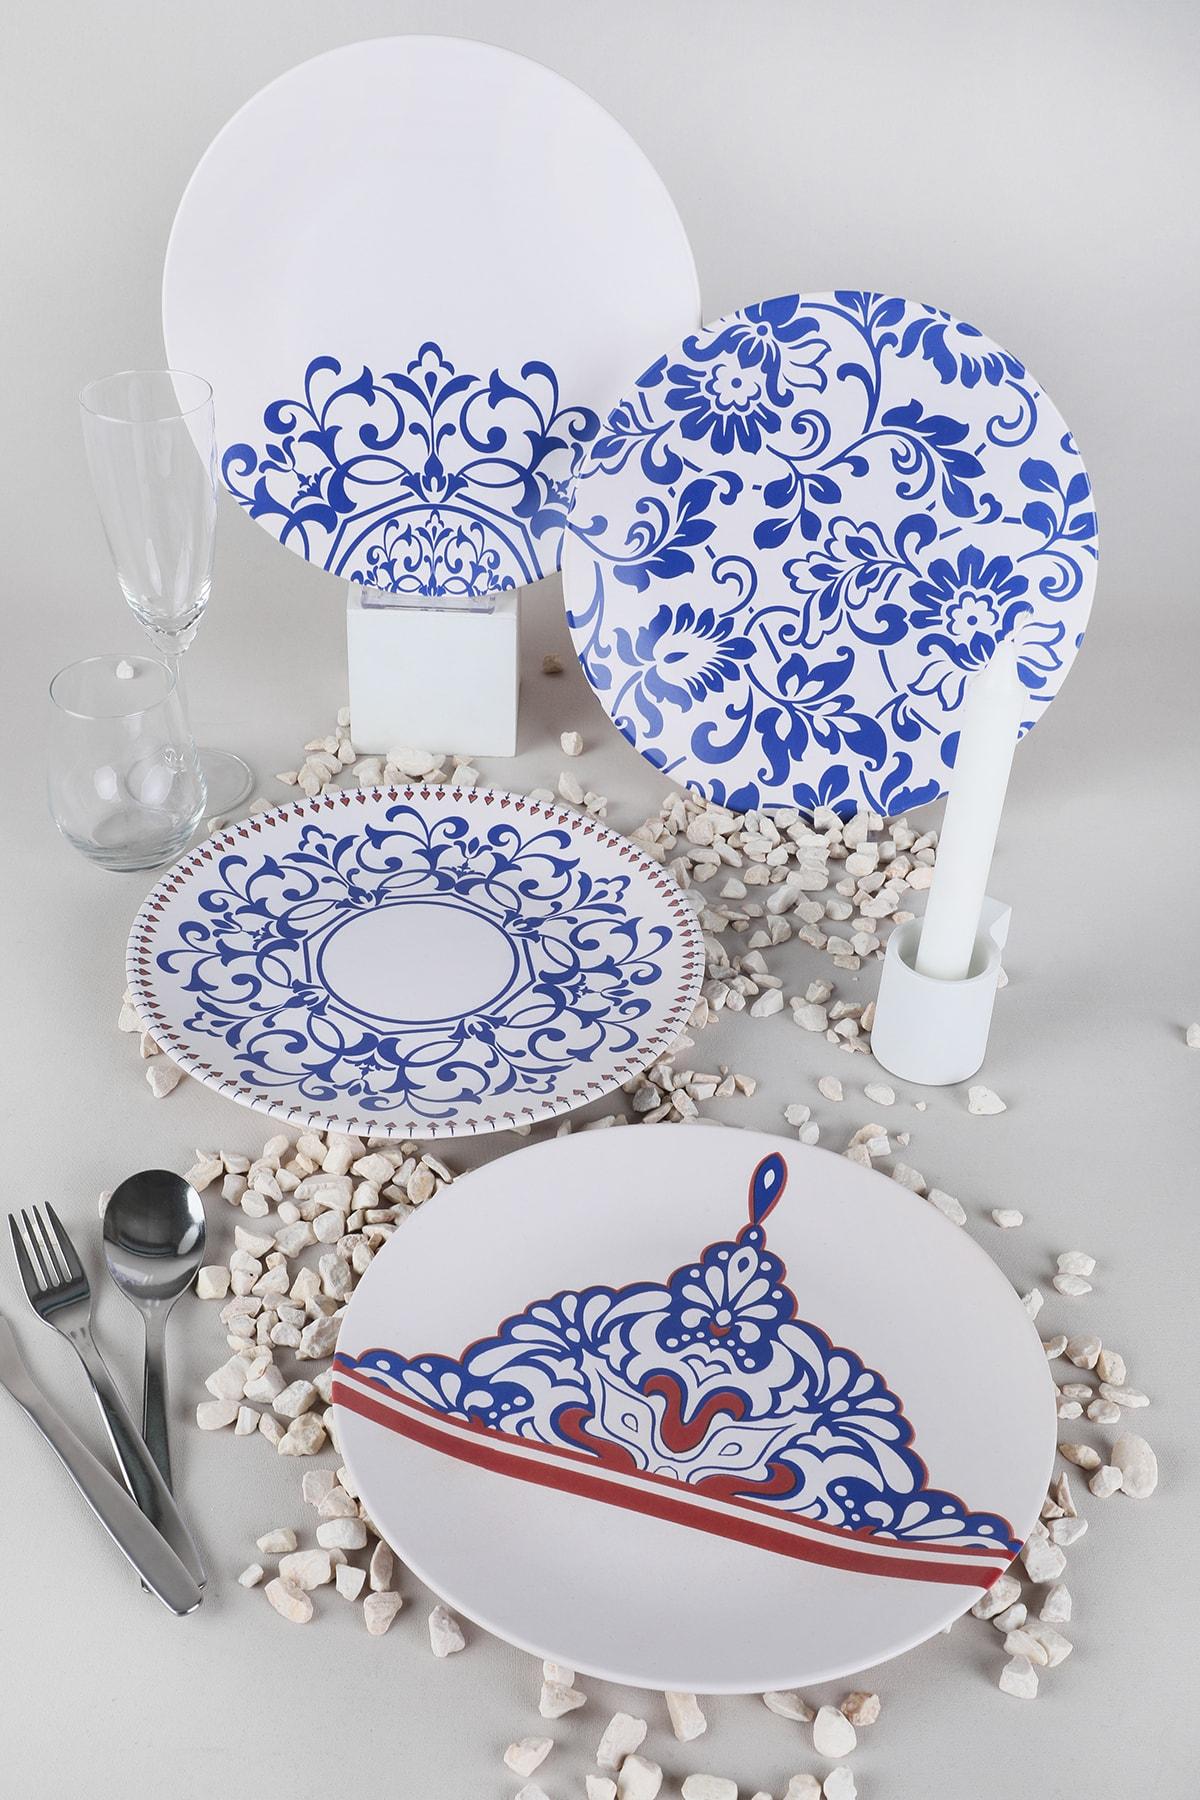 Blue Palace Servis Tabağı 25 Cm 4 Adet - 18925-27-28-44